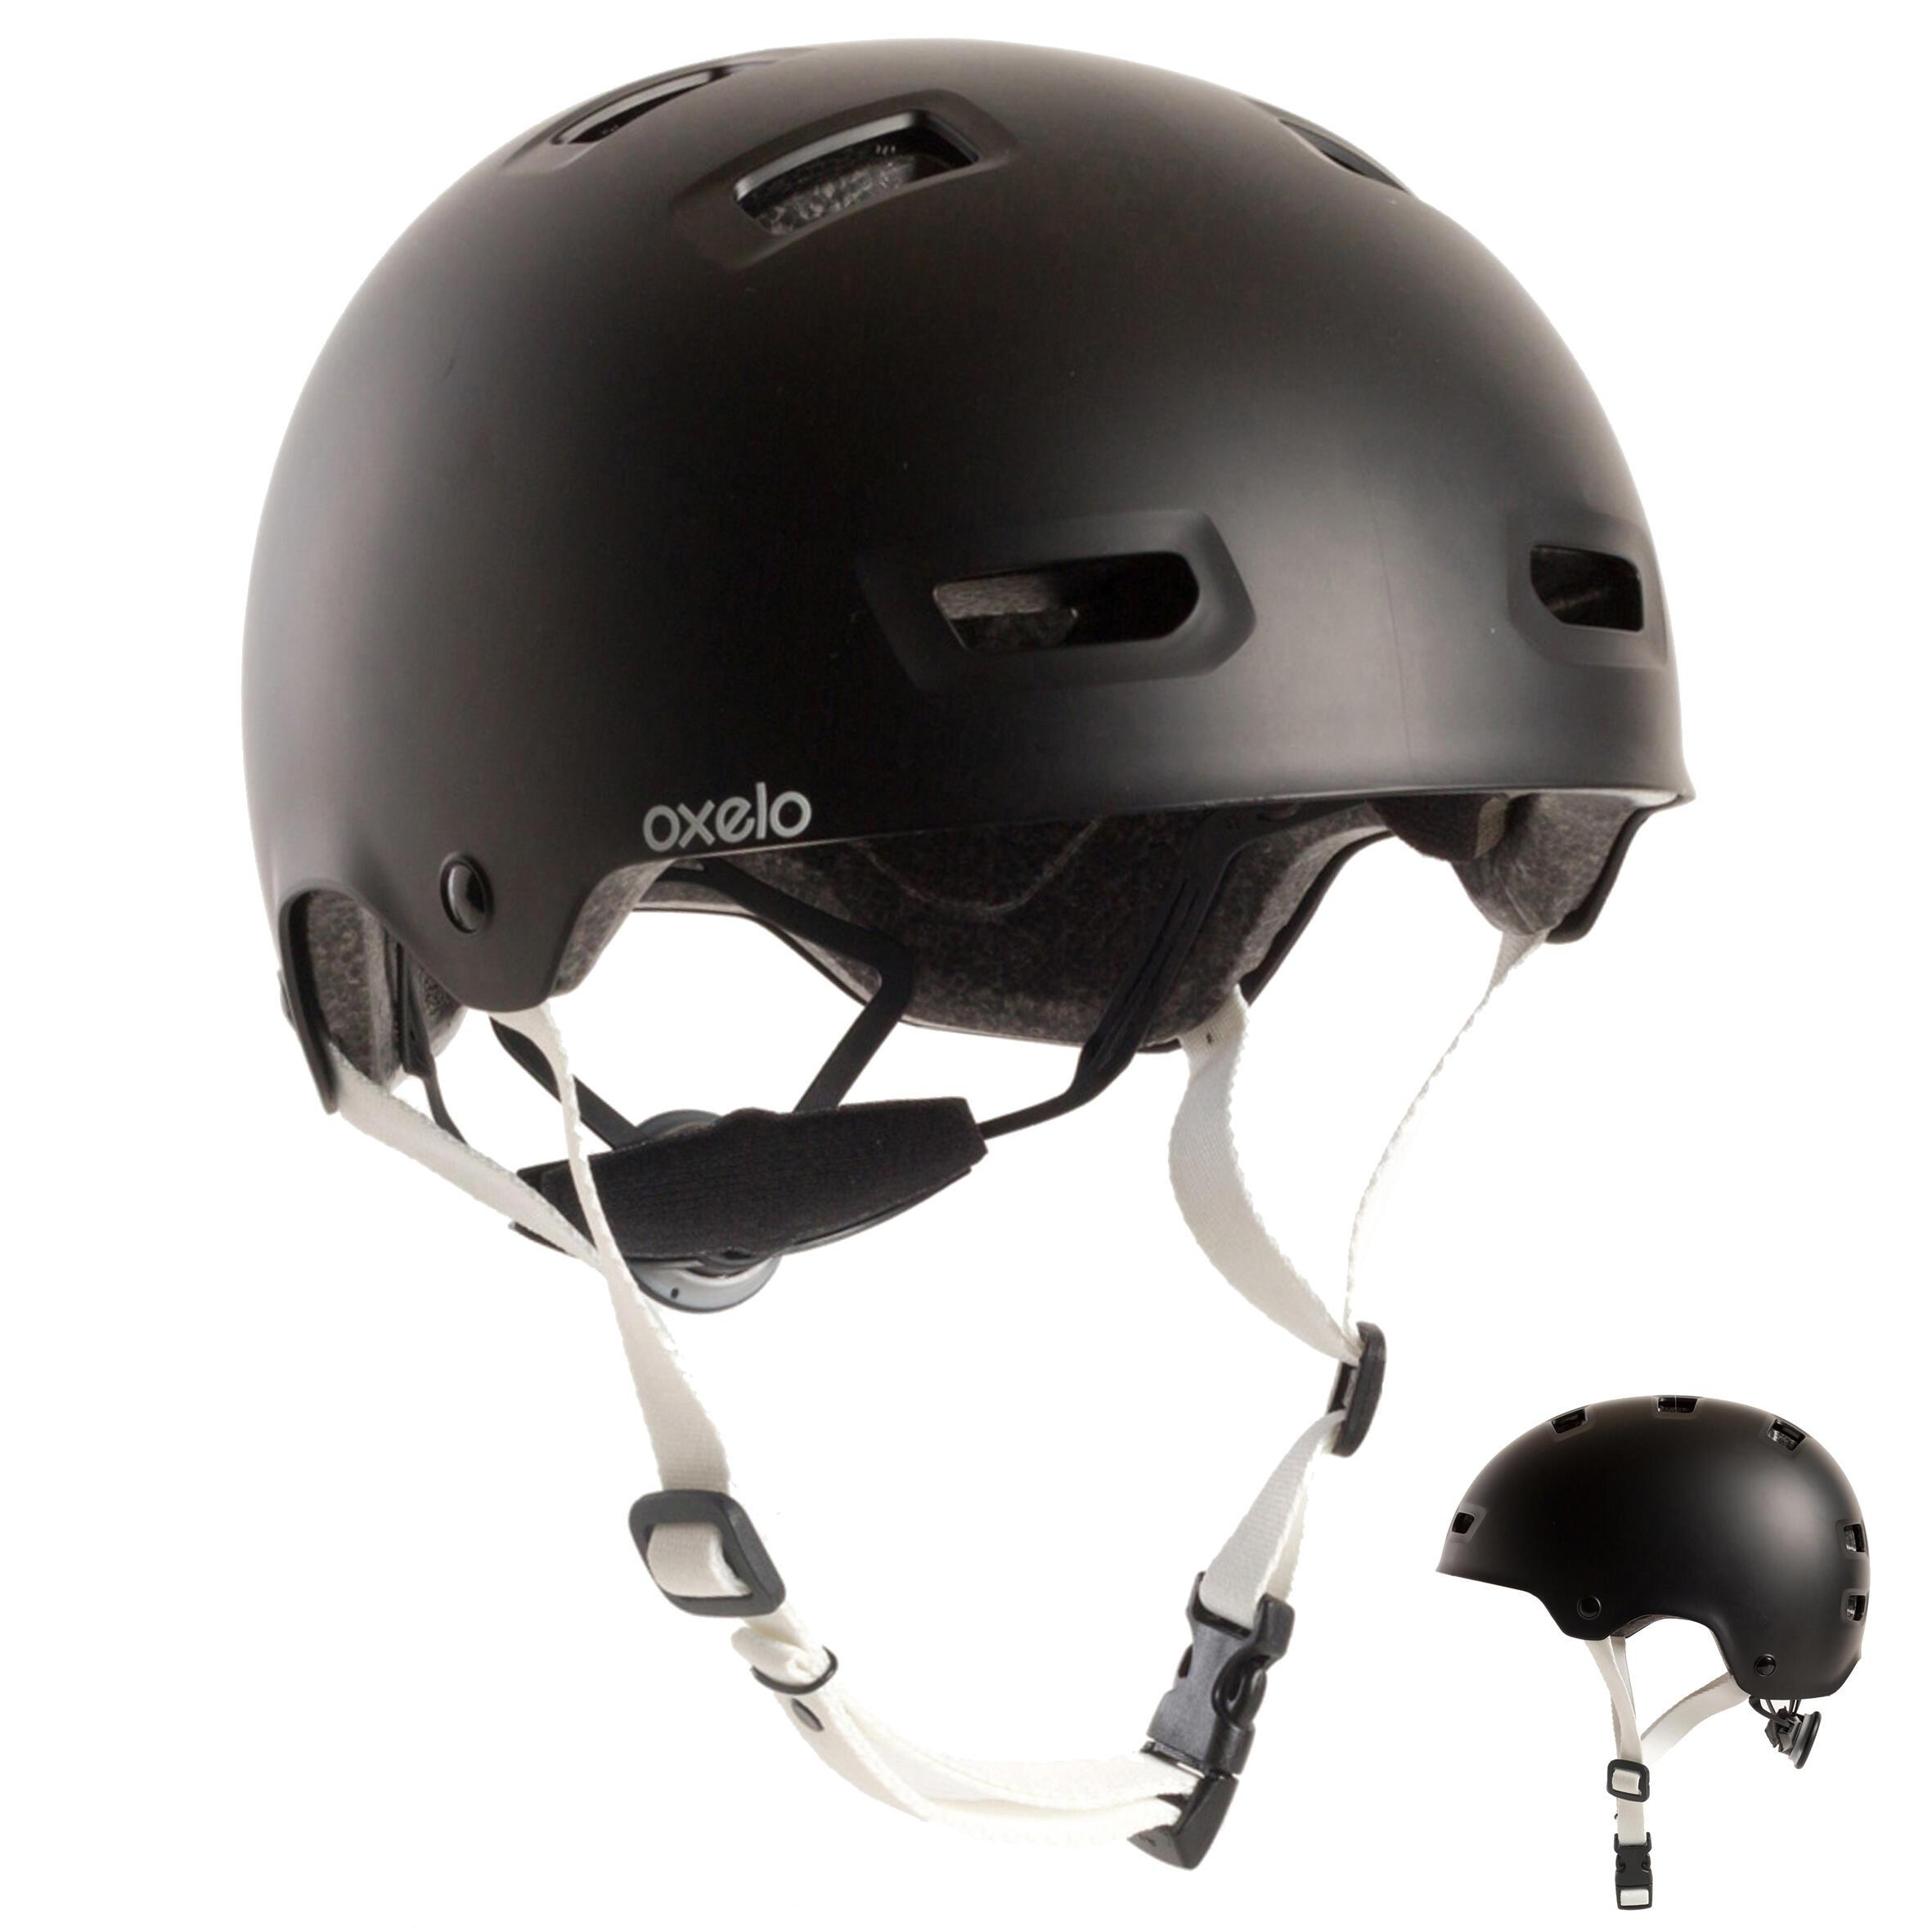 MF500 Inline Skating Skateboarding Scootering Helmet - Black